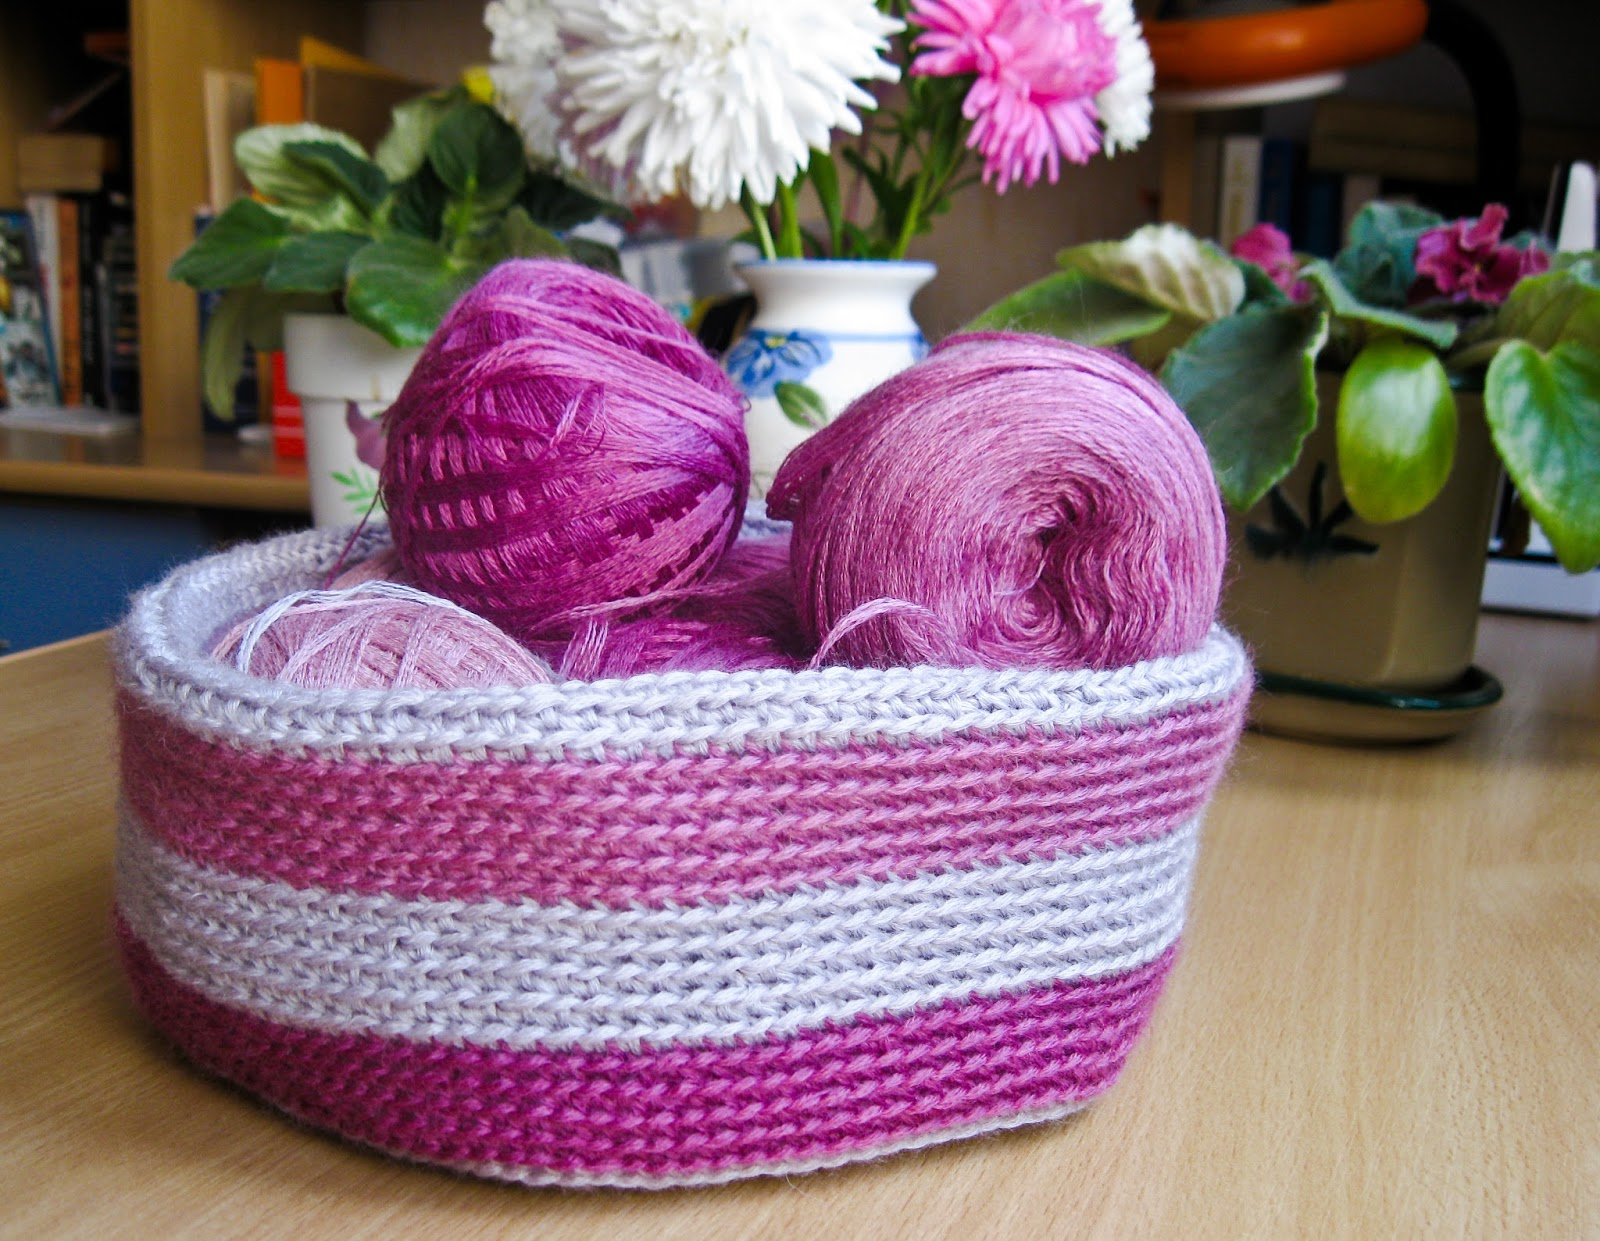 Вязание корзиночки крючком